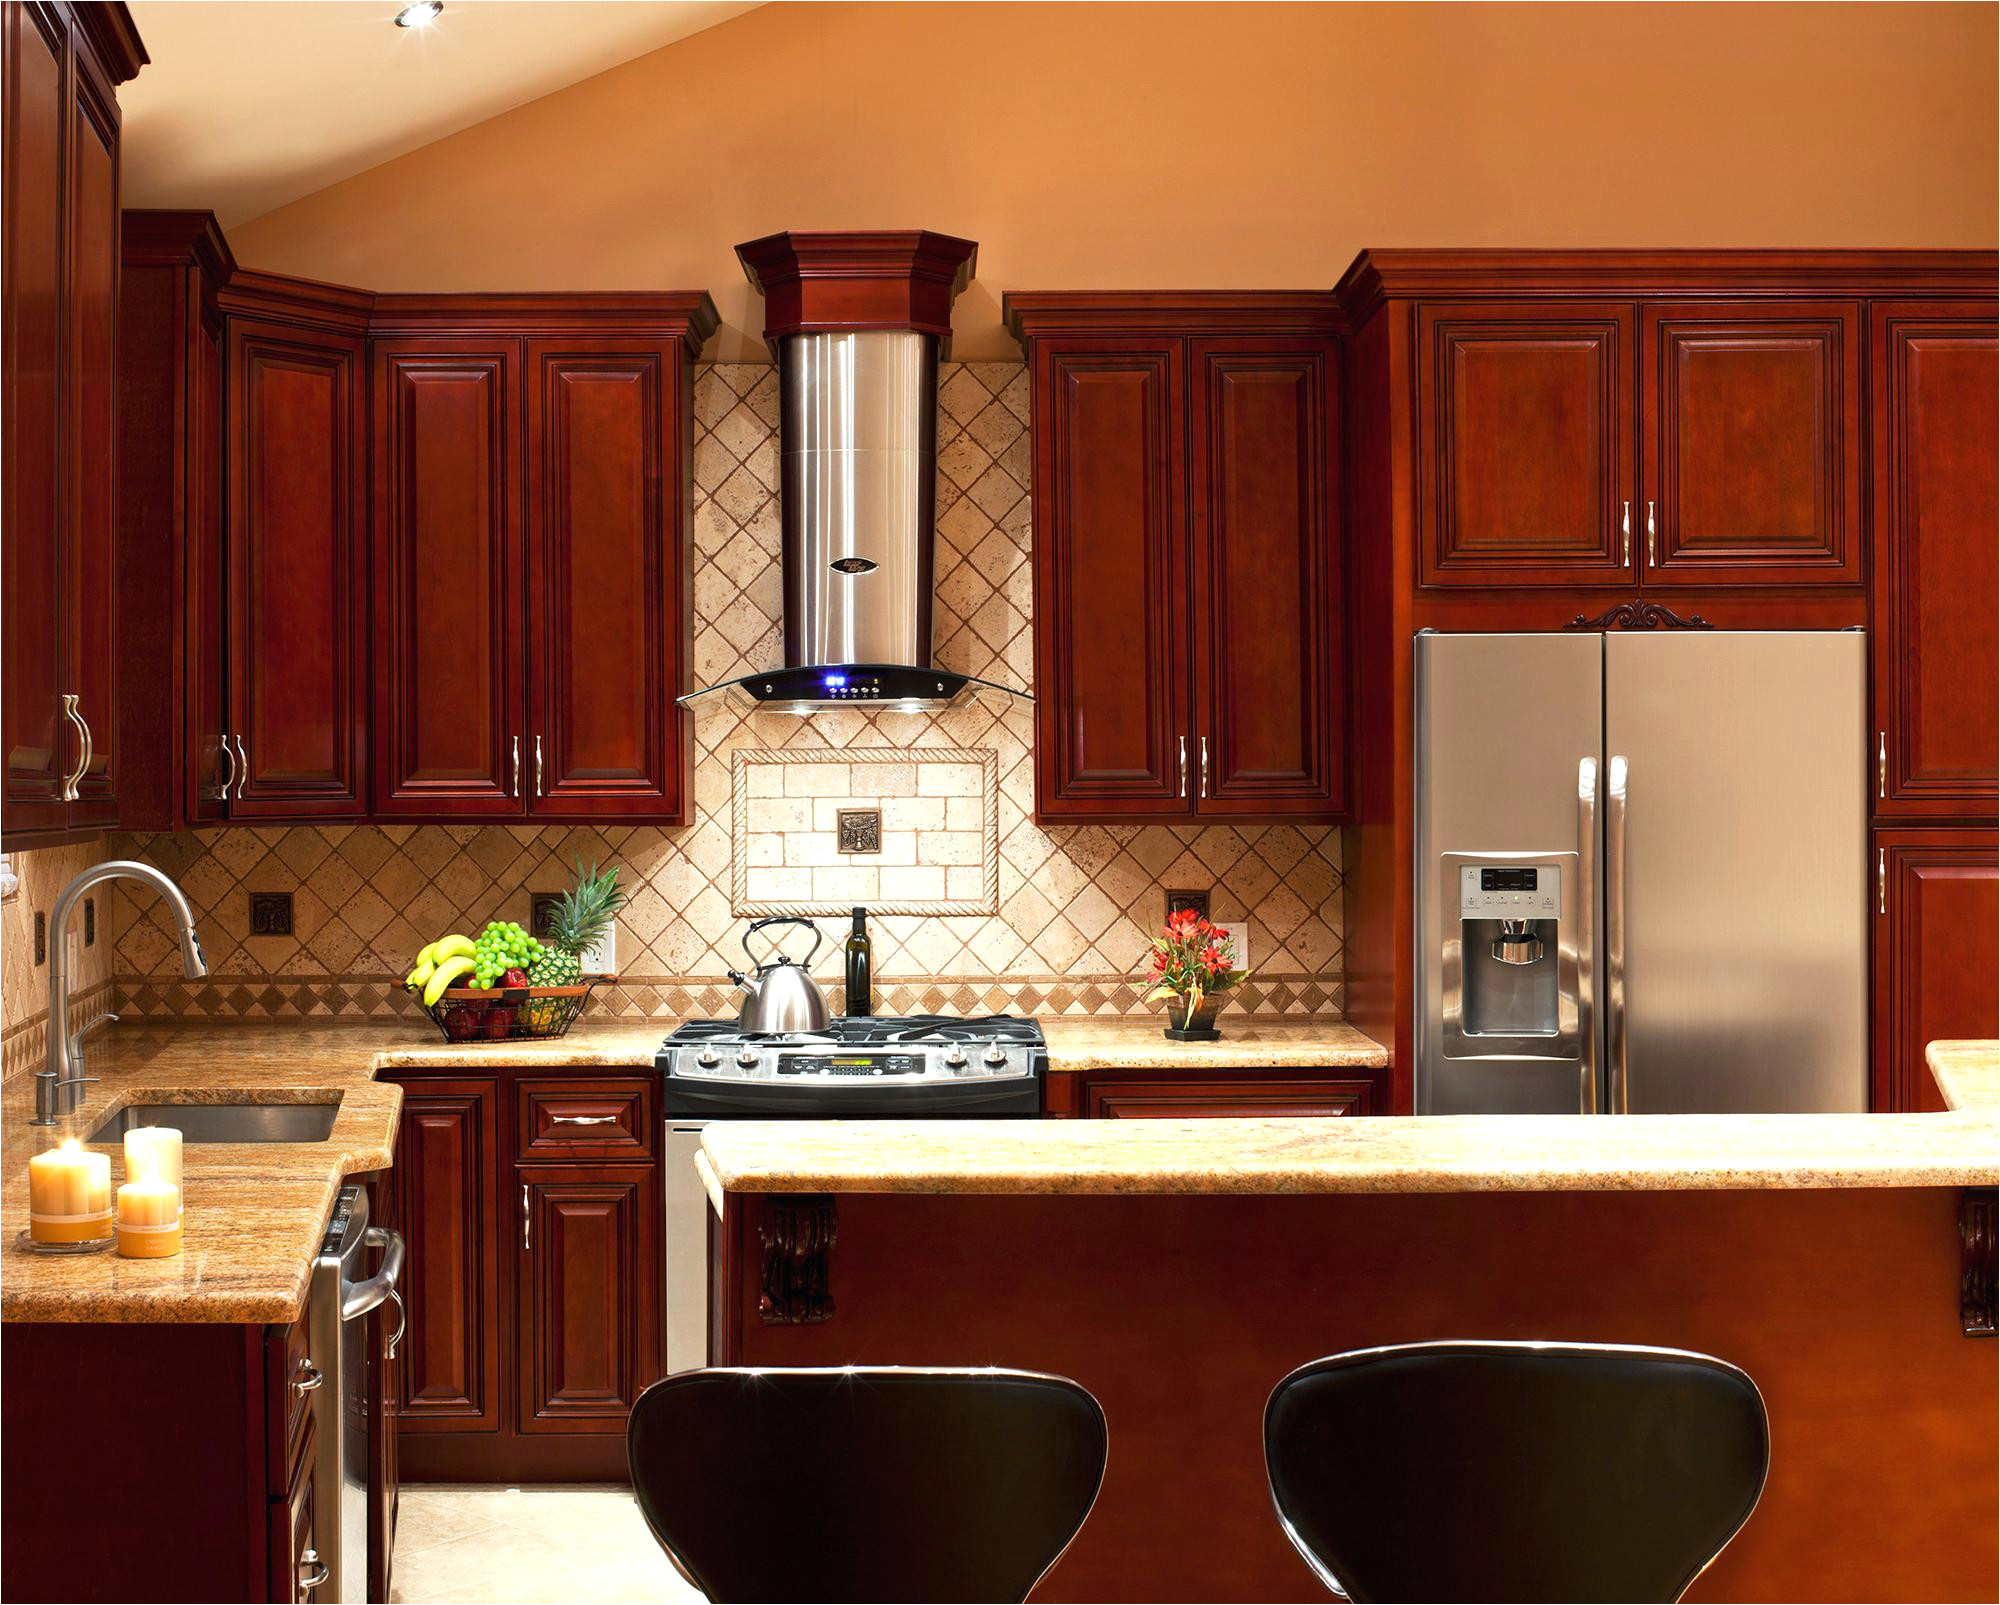 kitchen cabinet portland oregon fresh kitchen cabinet hardware nj new wood cabinets unique used luxury 0d